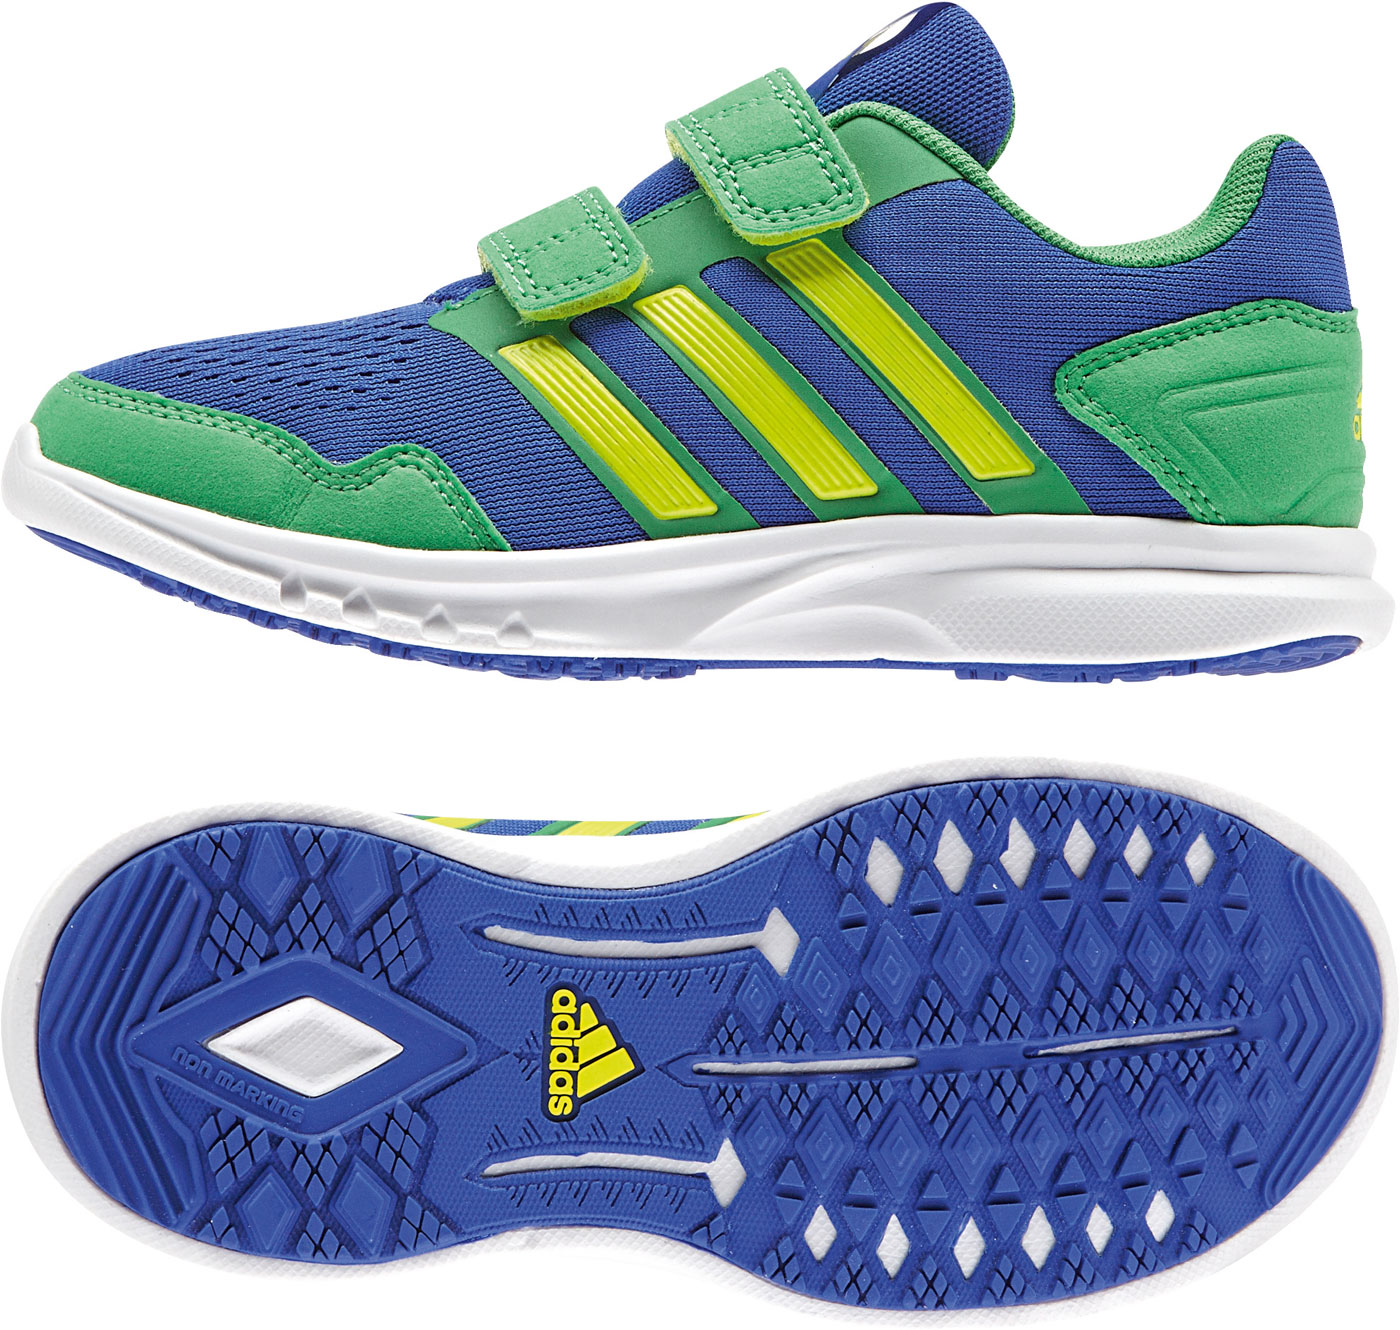 Kinder Schuh Runfastic CF K